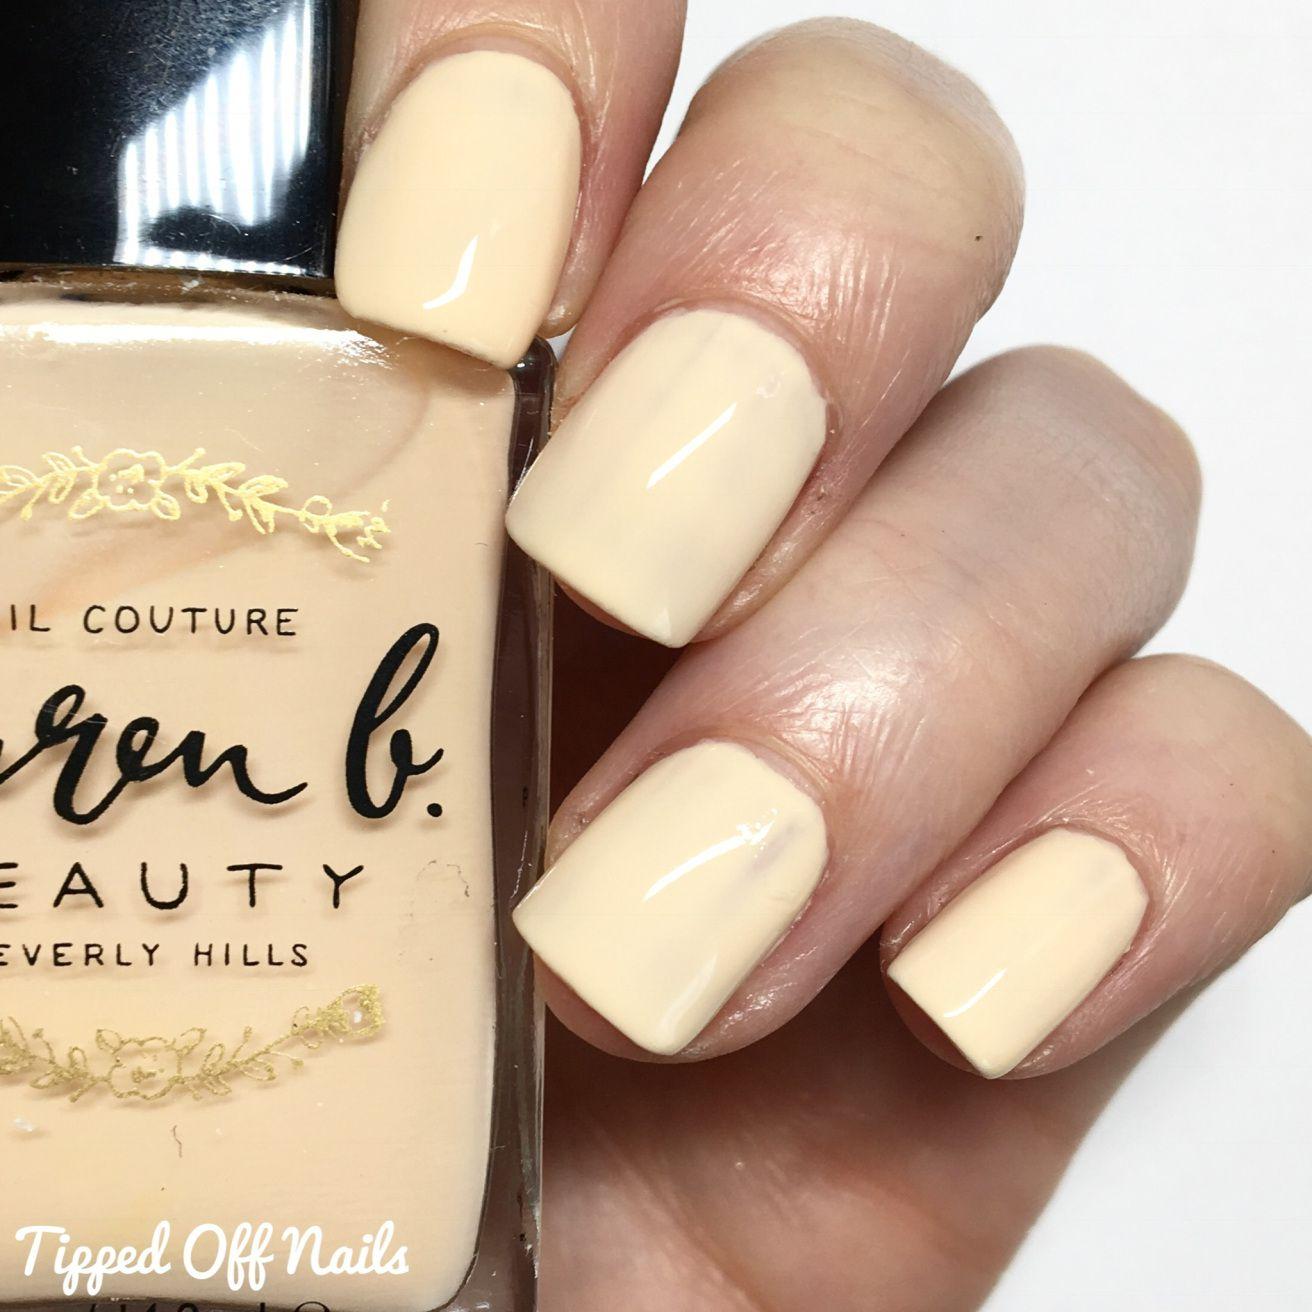 Lauren B Beauty Nude No. 1 Nail Polish Nude Matte 14.8 ml: Buy ...